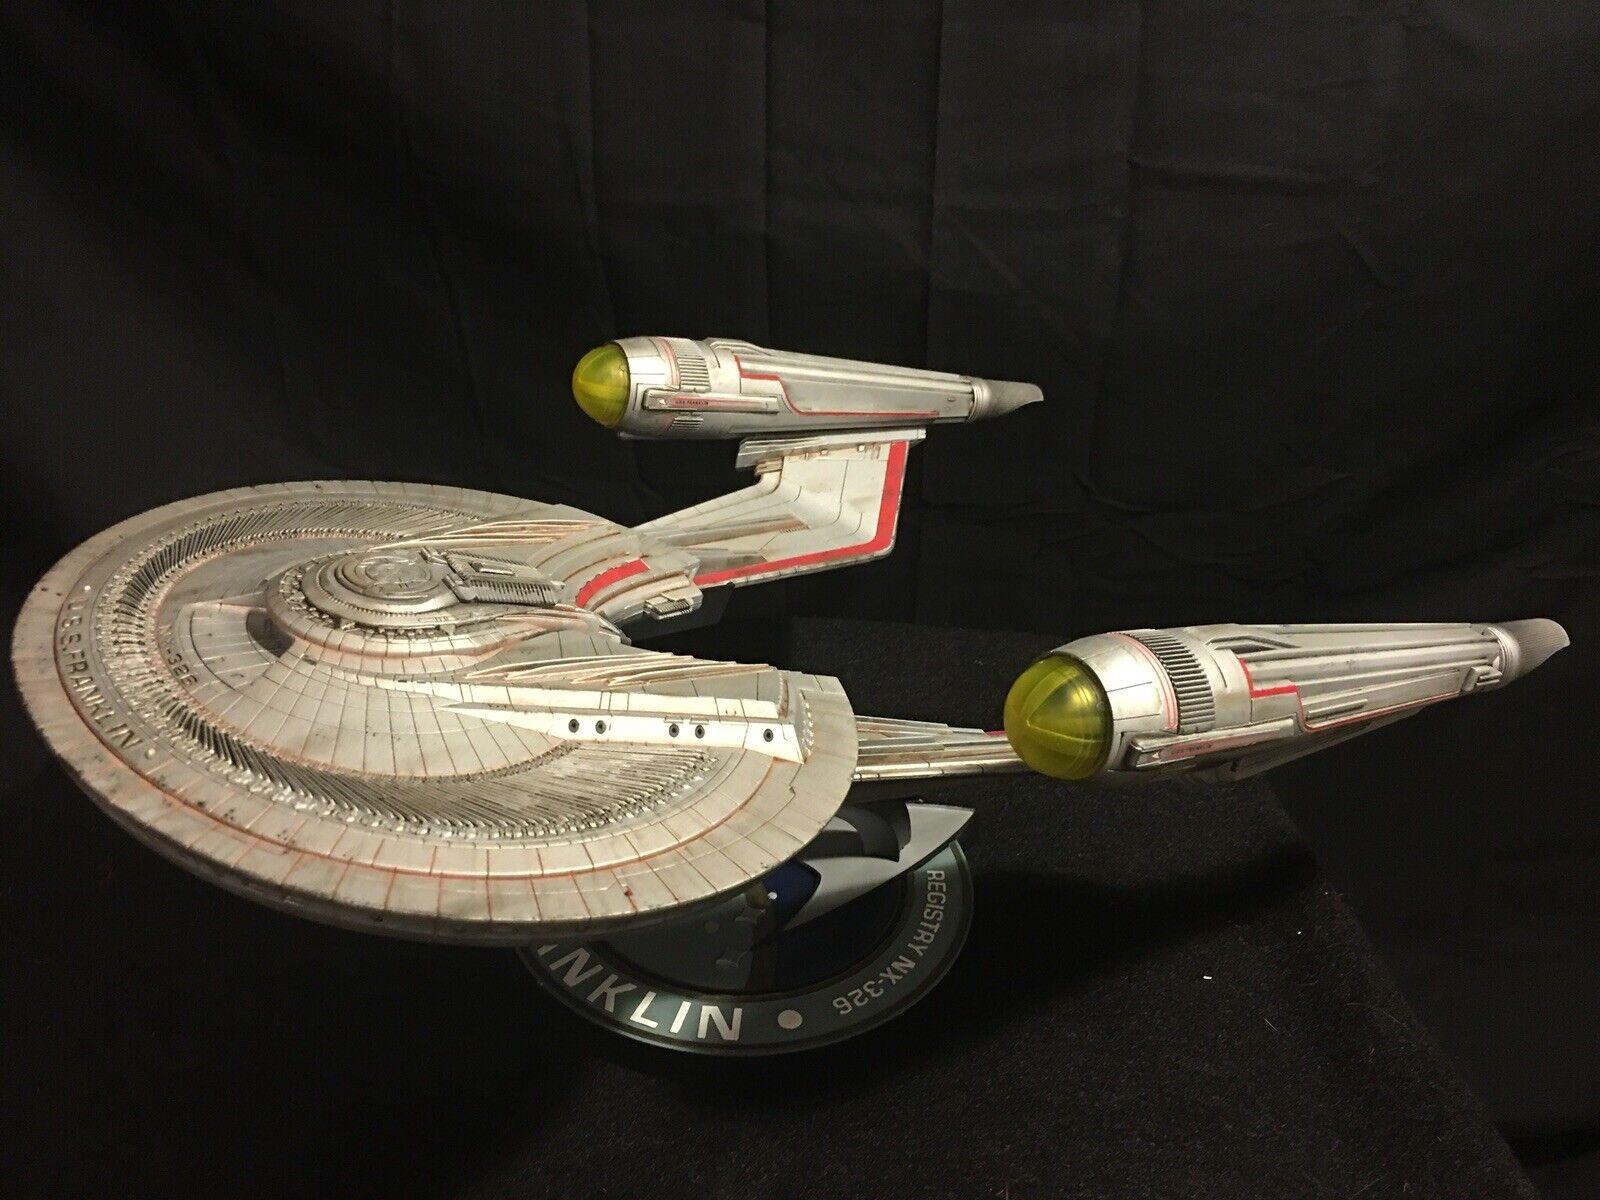 Star Trek USS Franklin Model - Moebius 1 350 -  FULLY BUILT & PAINTED